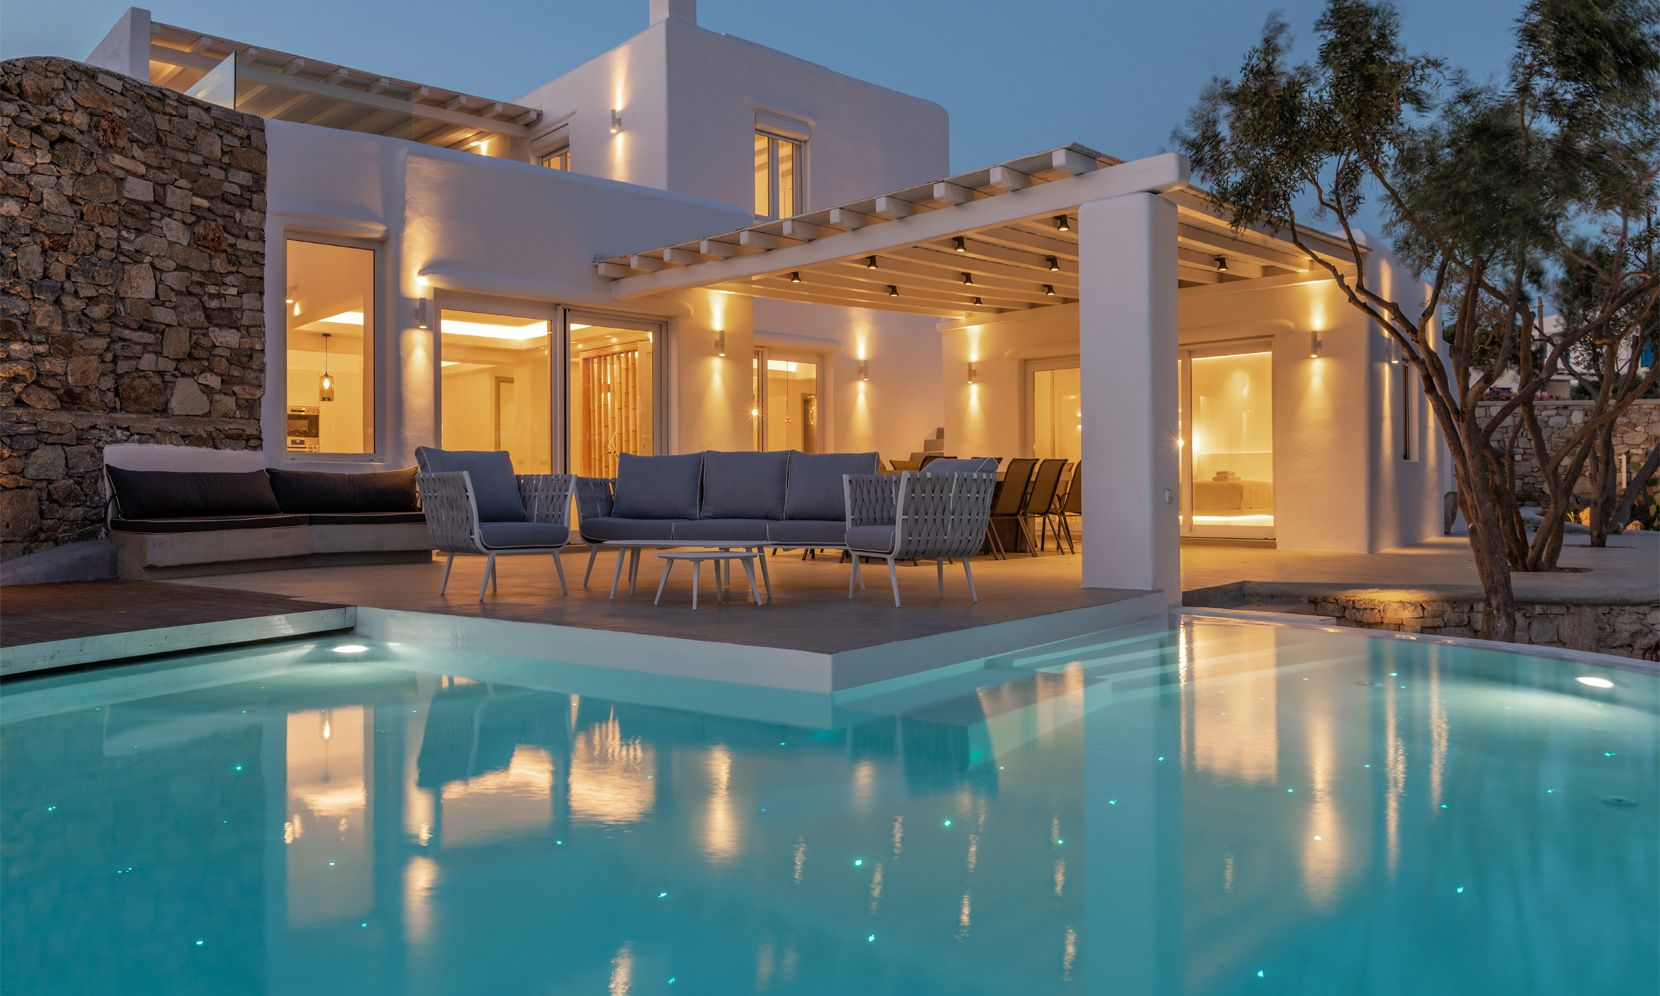 Mykonos Villa Victor jumbotron image